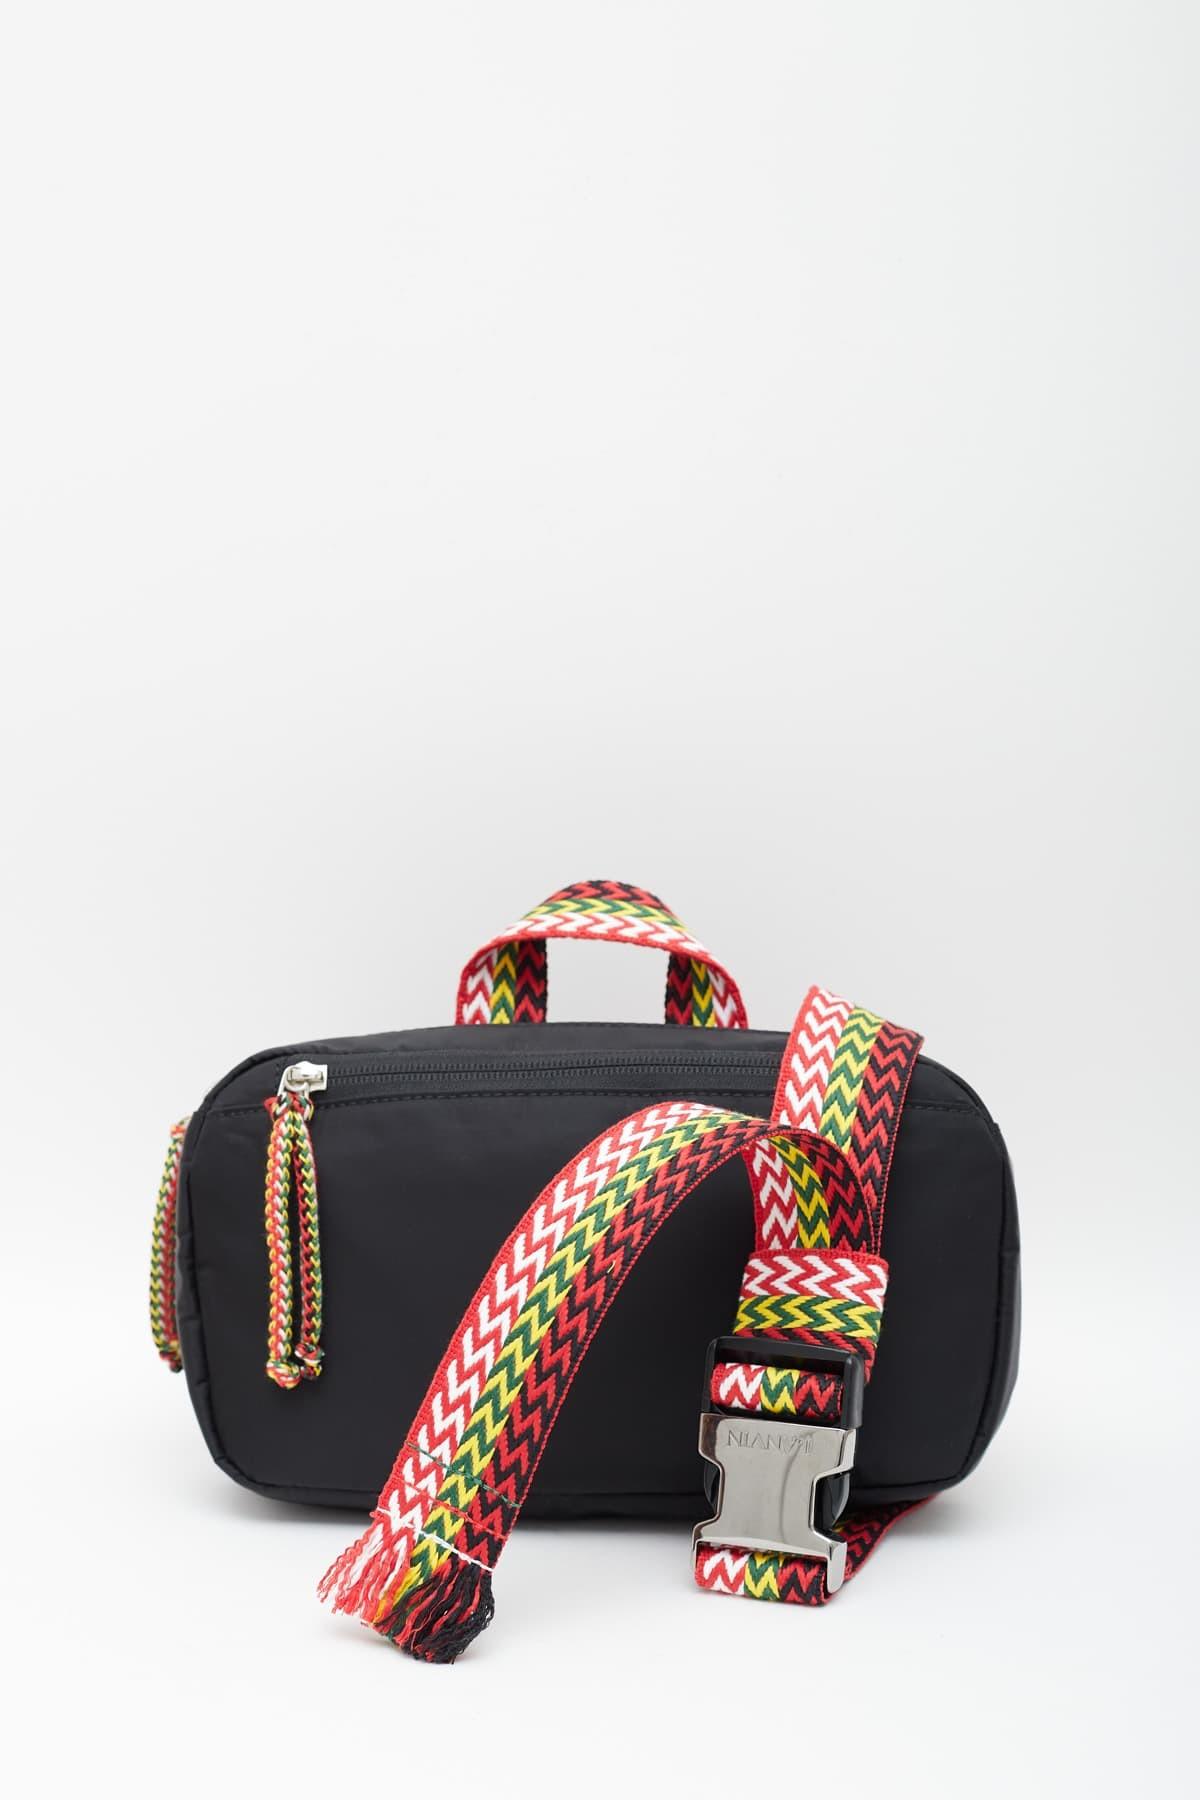 Comprar Carhartt Wip Dusty H Brown Double Knee Pant